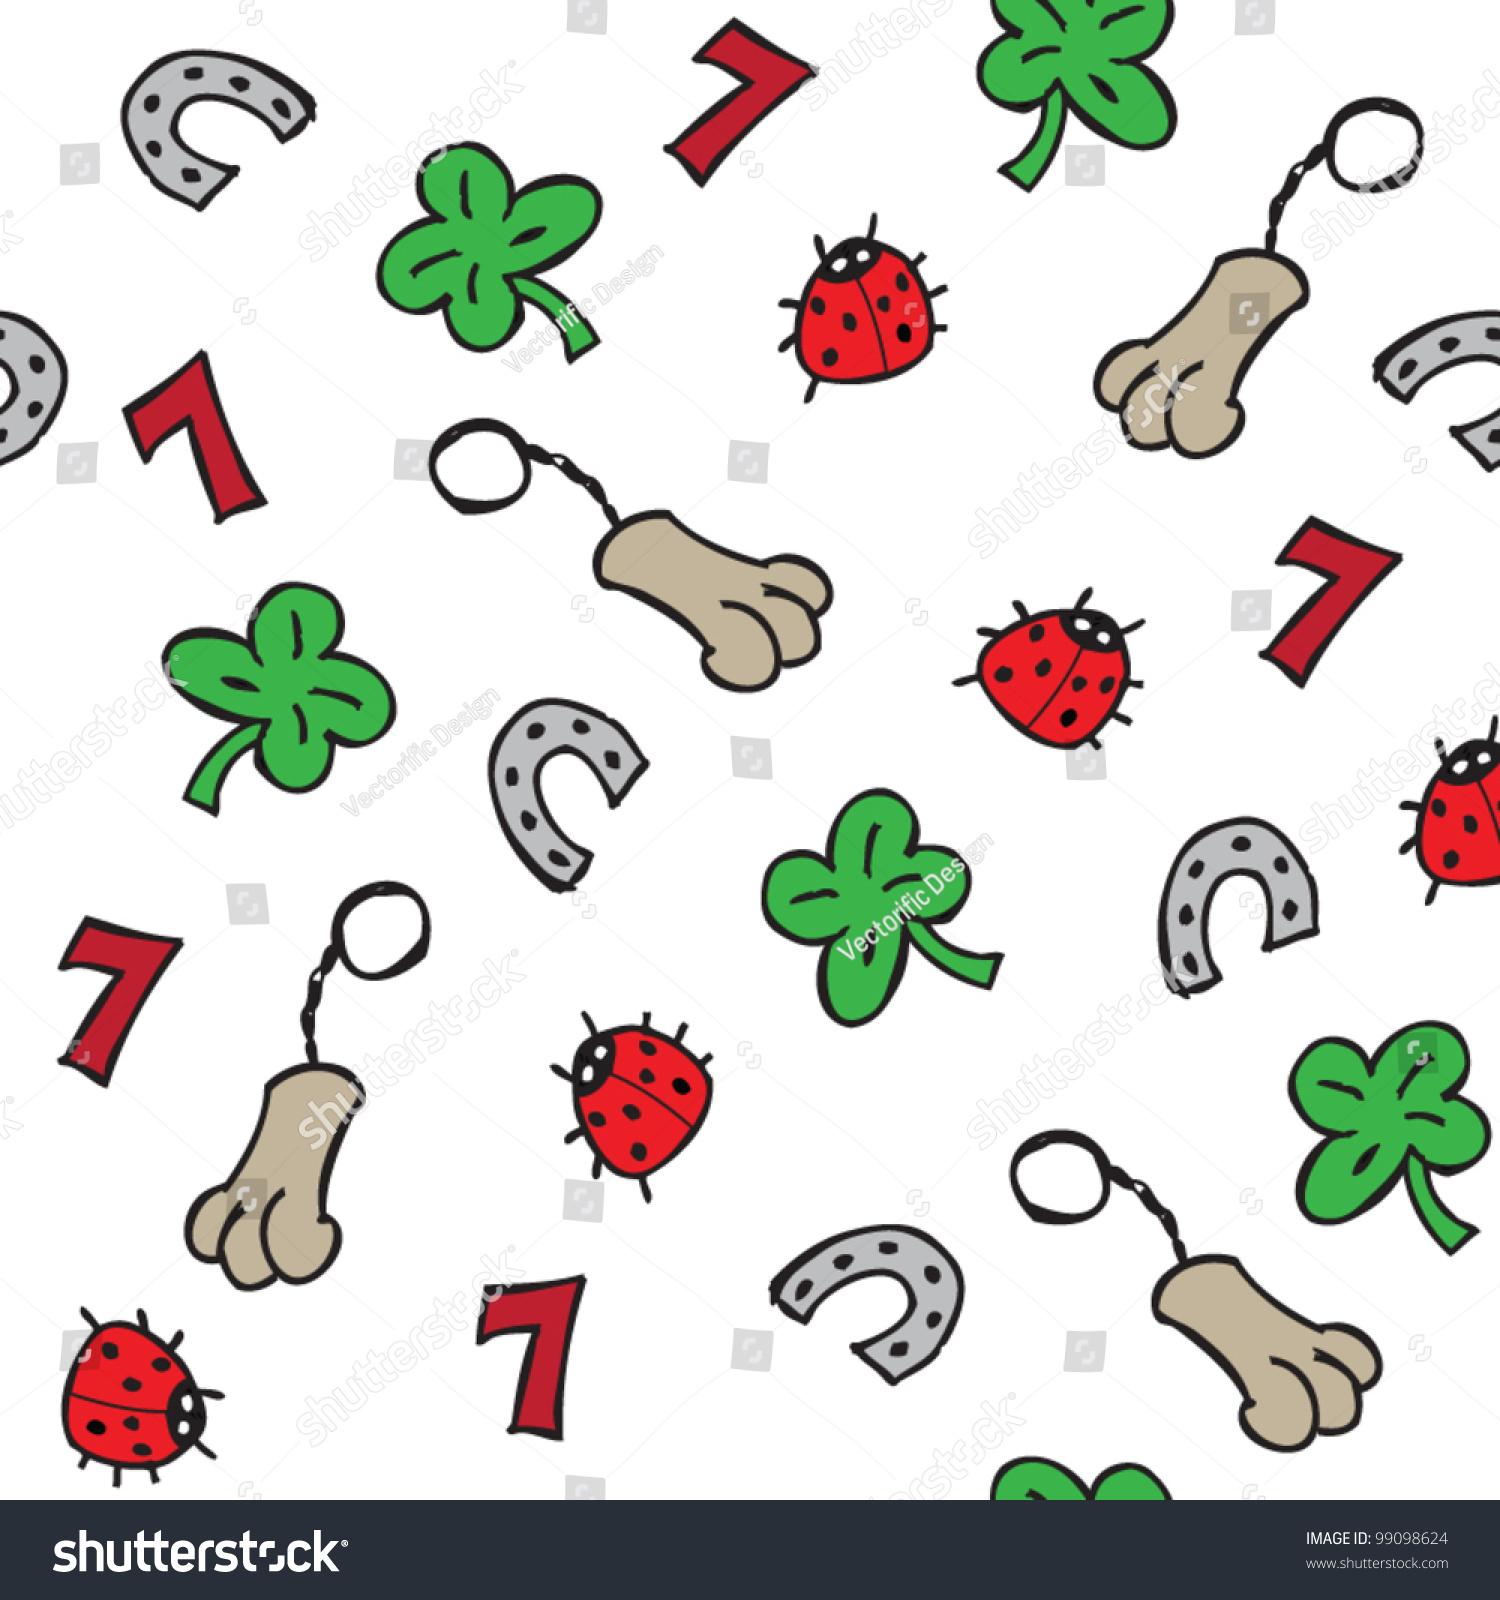 Lucky charms illustration seamless pattern stock vector 99098624 lucky charms illustration seamless pattern buycottarizona Images